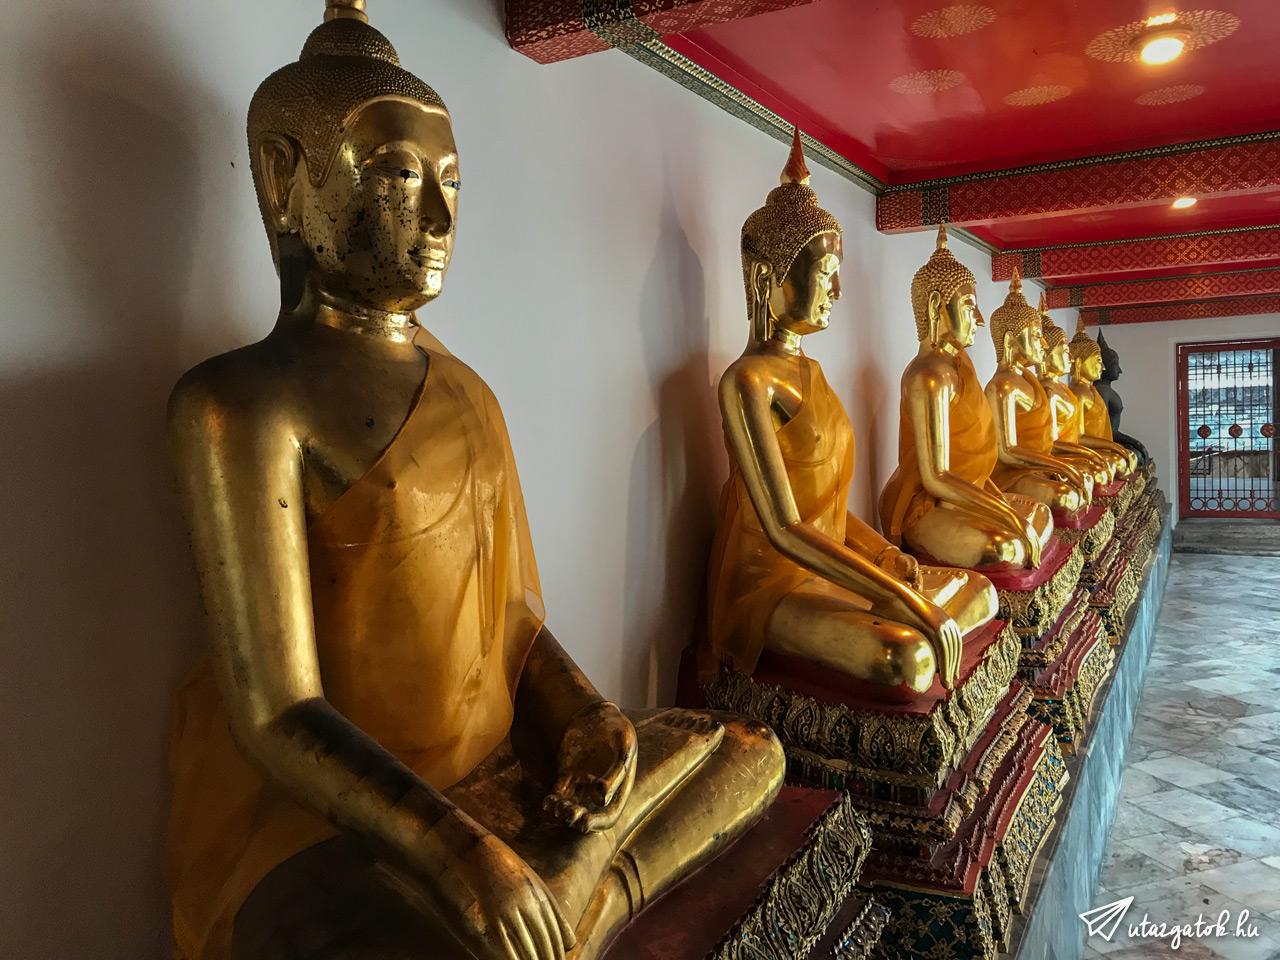 hímvesszők temploma Bangkokban)